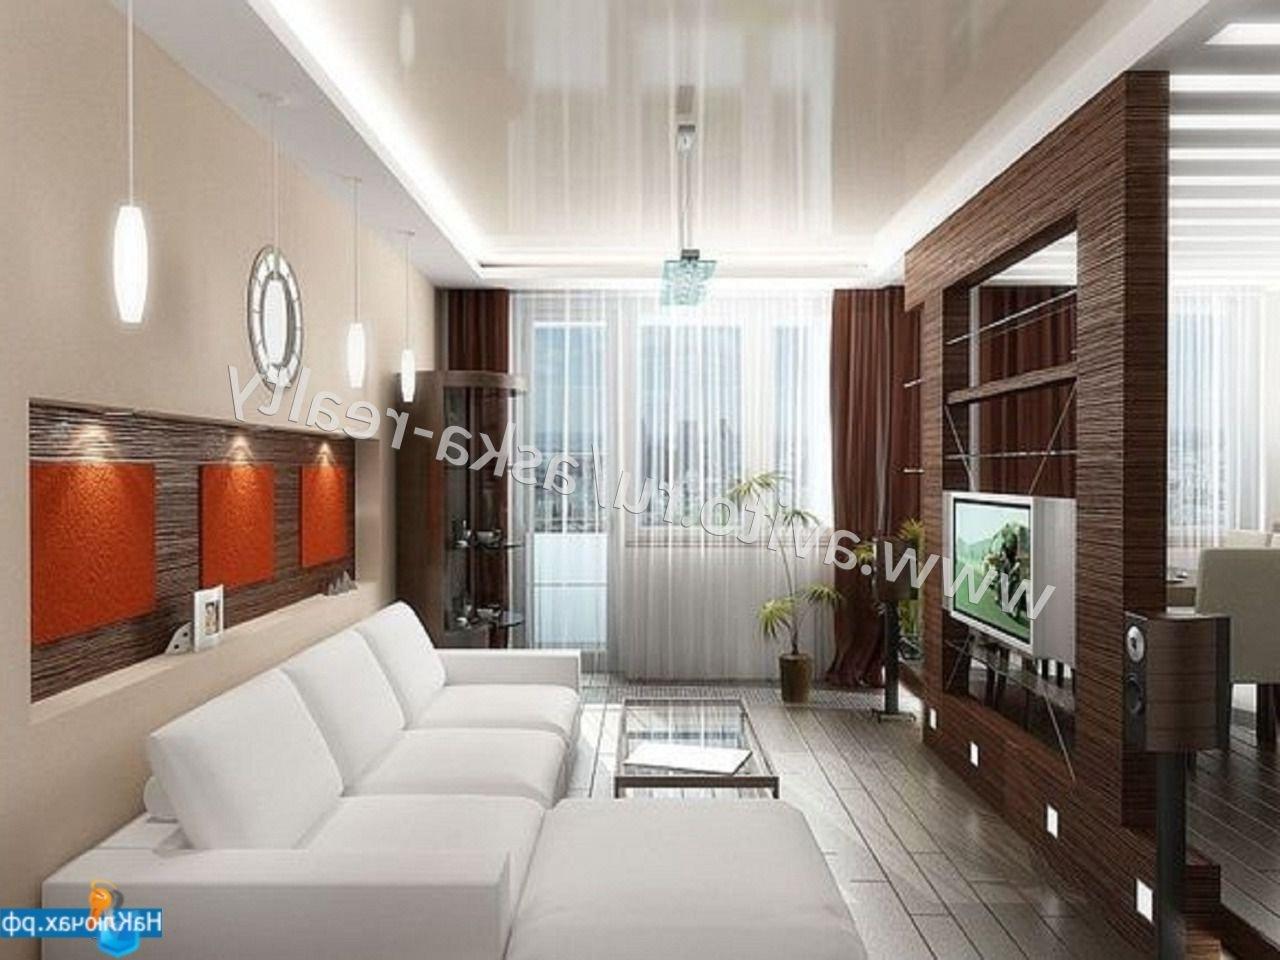 Amazing furniture designs - home interior design ideas home .